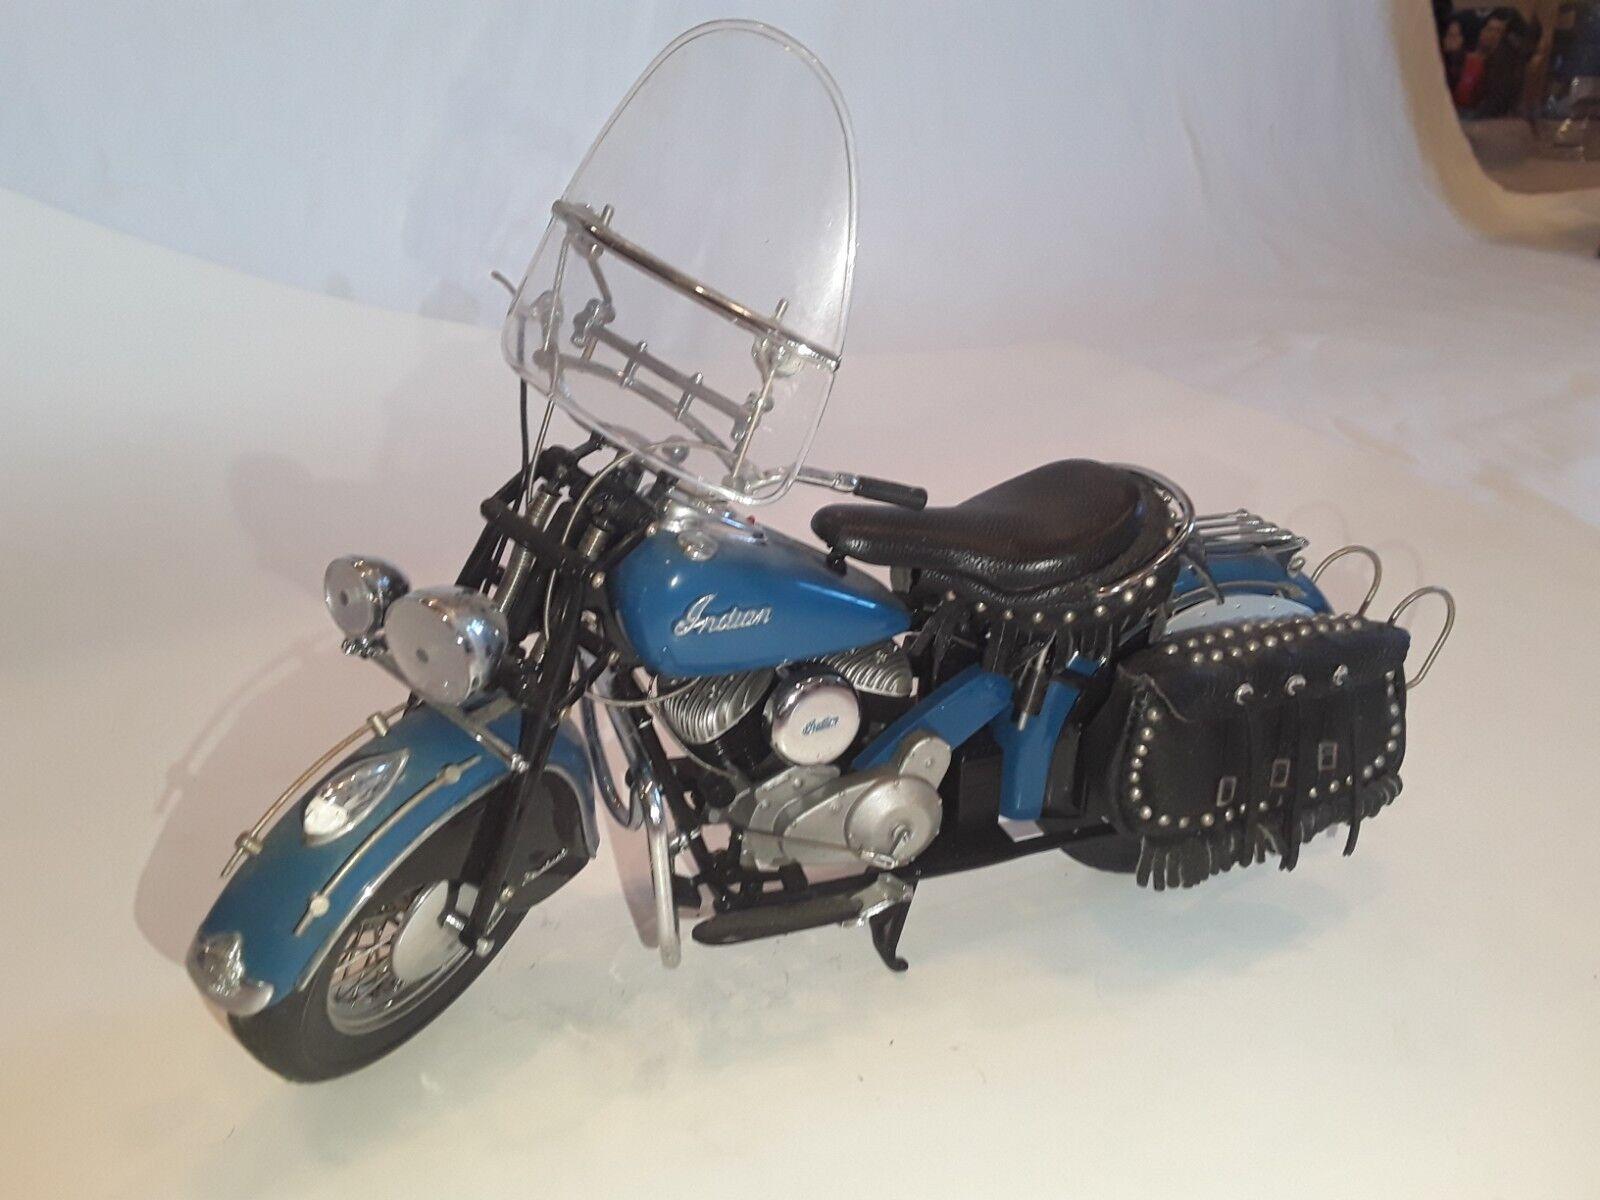 DANBURY Comme neuf 1 10 1948 chef indien, Roadmaster moto